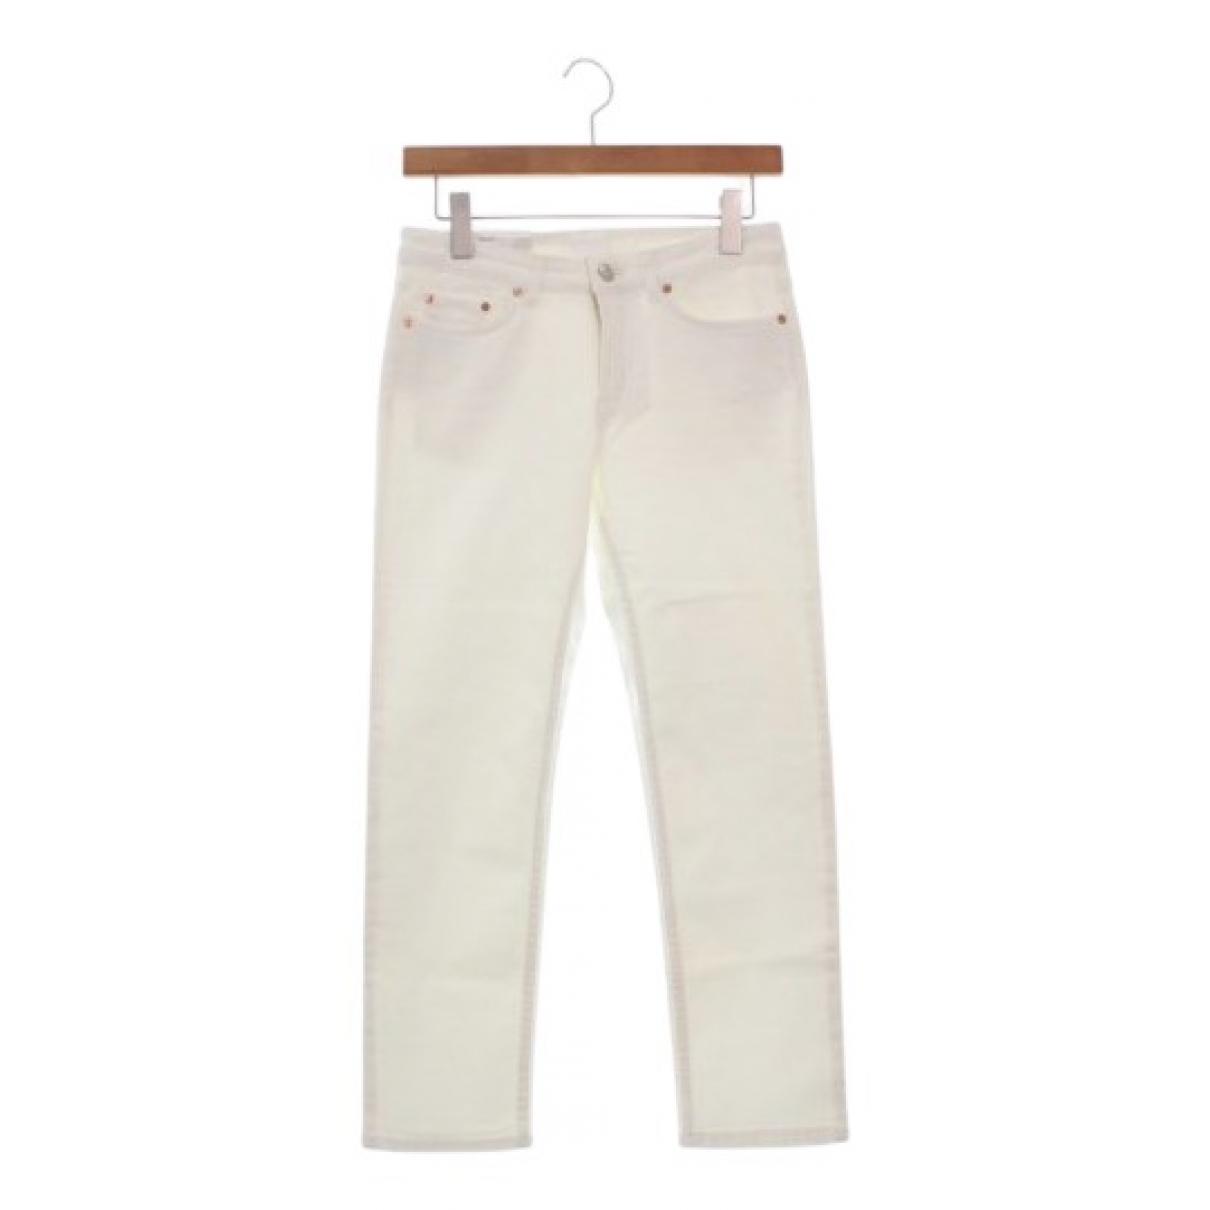 Acne Studios N White Cotton Trousers for Women 32 FR